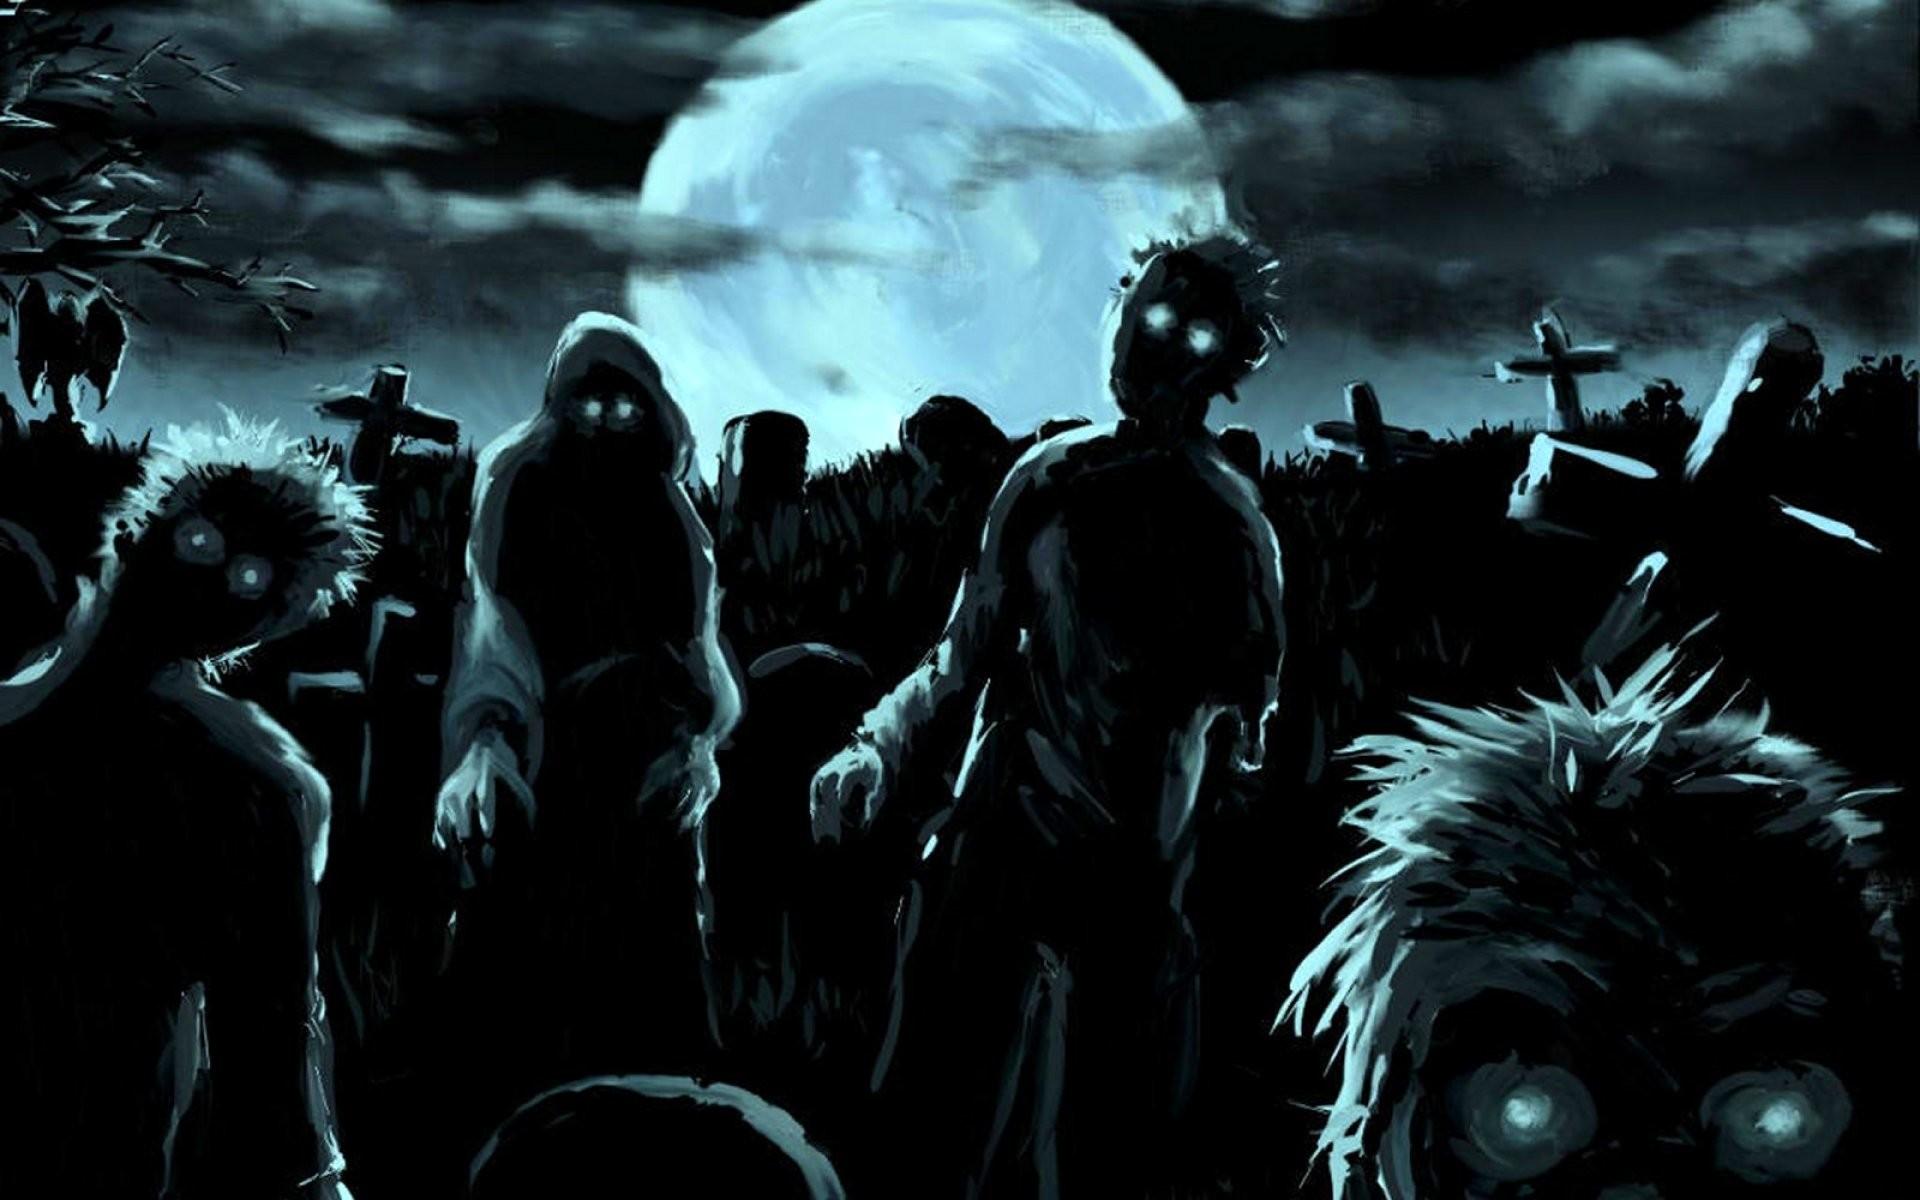 Evil fantasy wallpaper 75 images - Dark horror creepy wallpapers ...